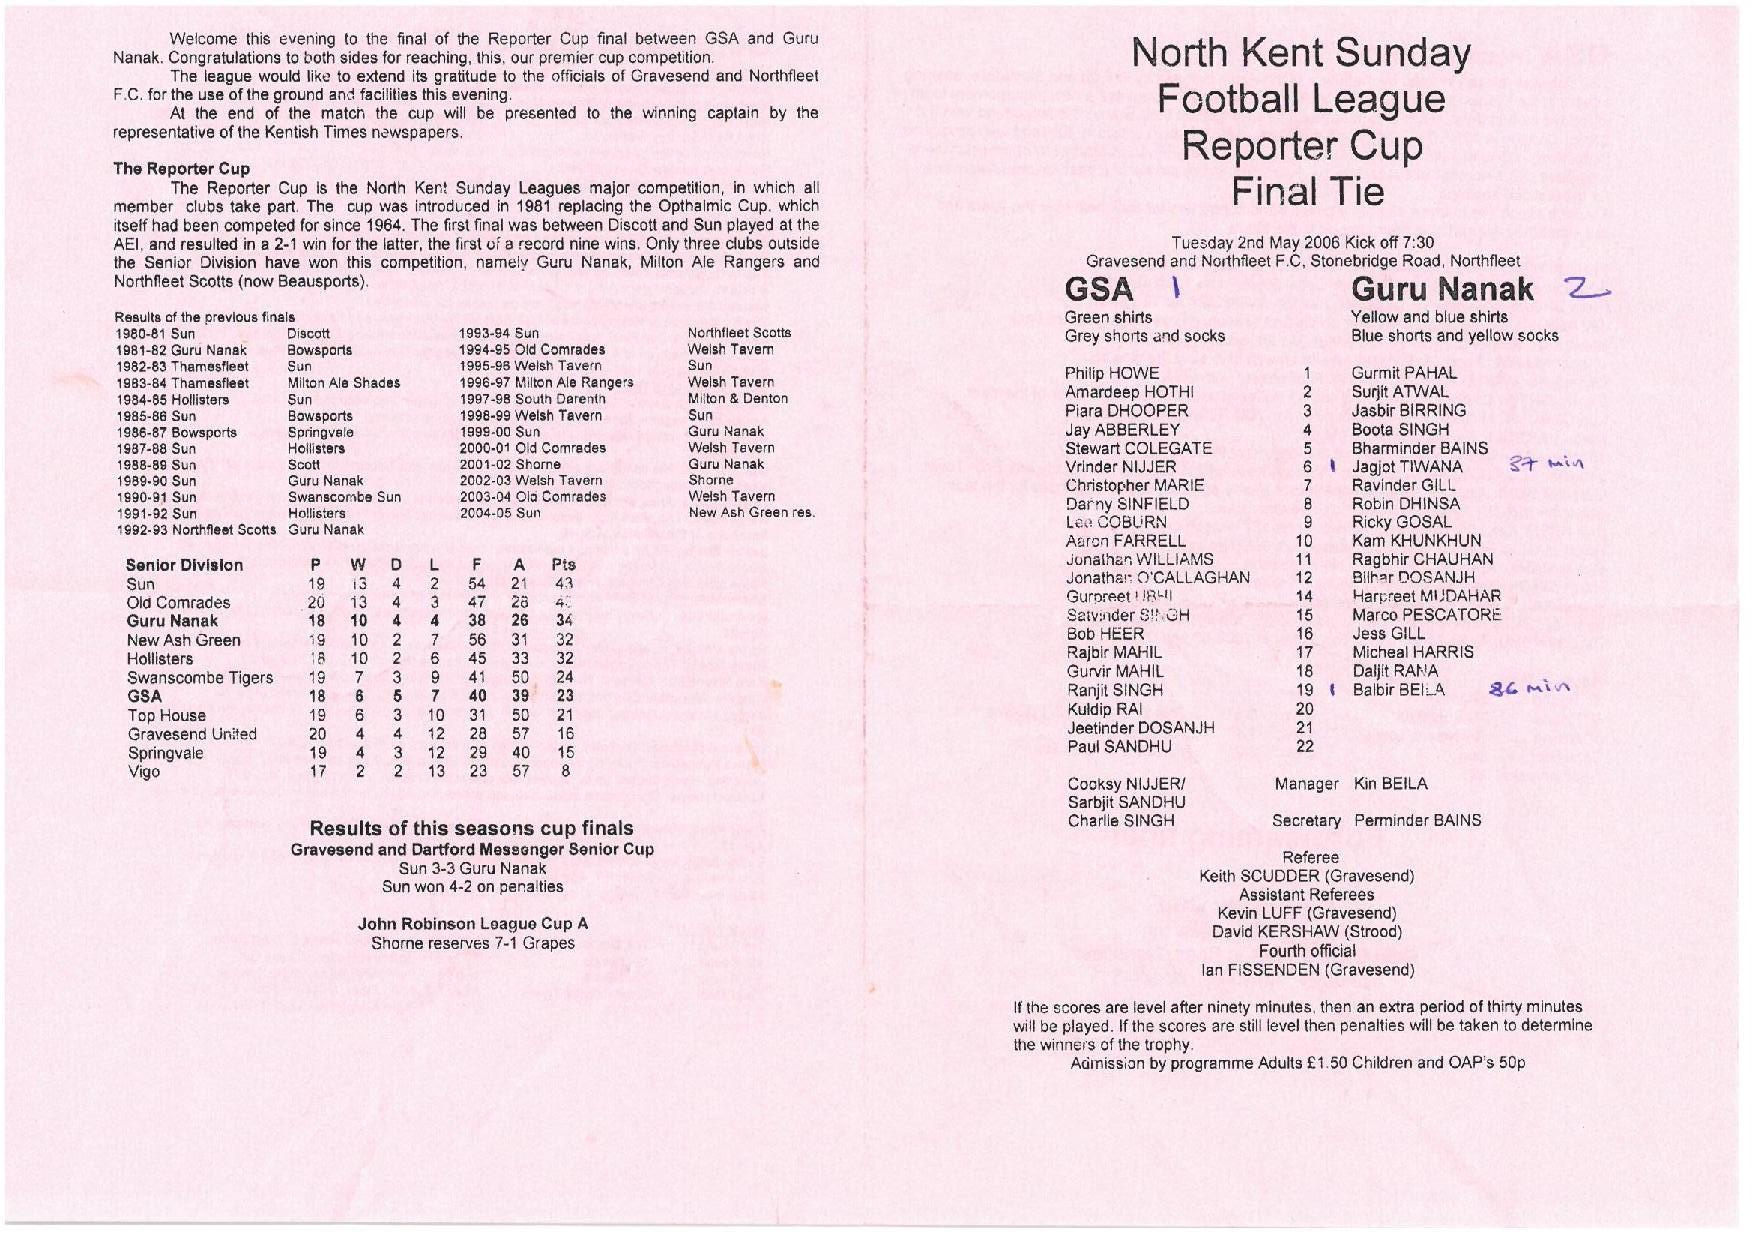 Reporter Cup Final 2006